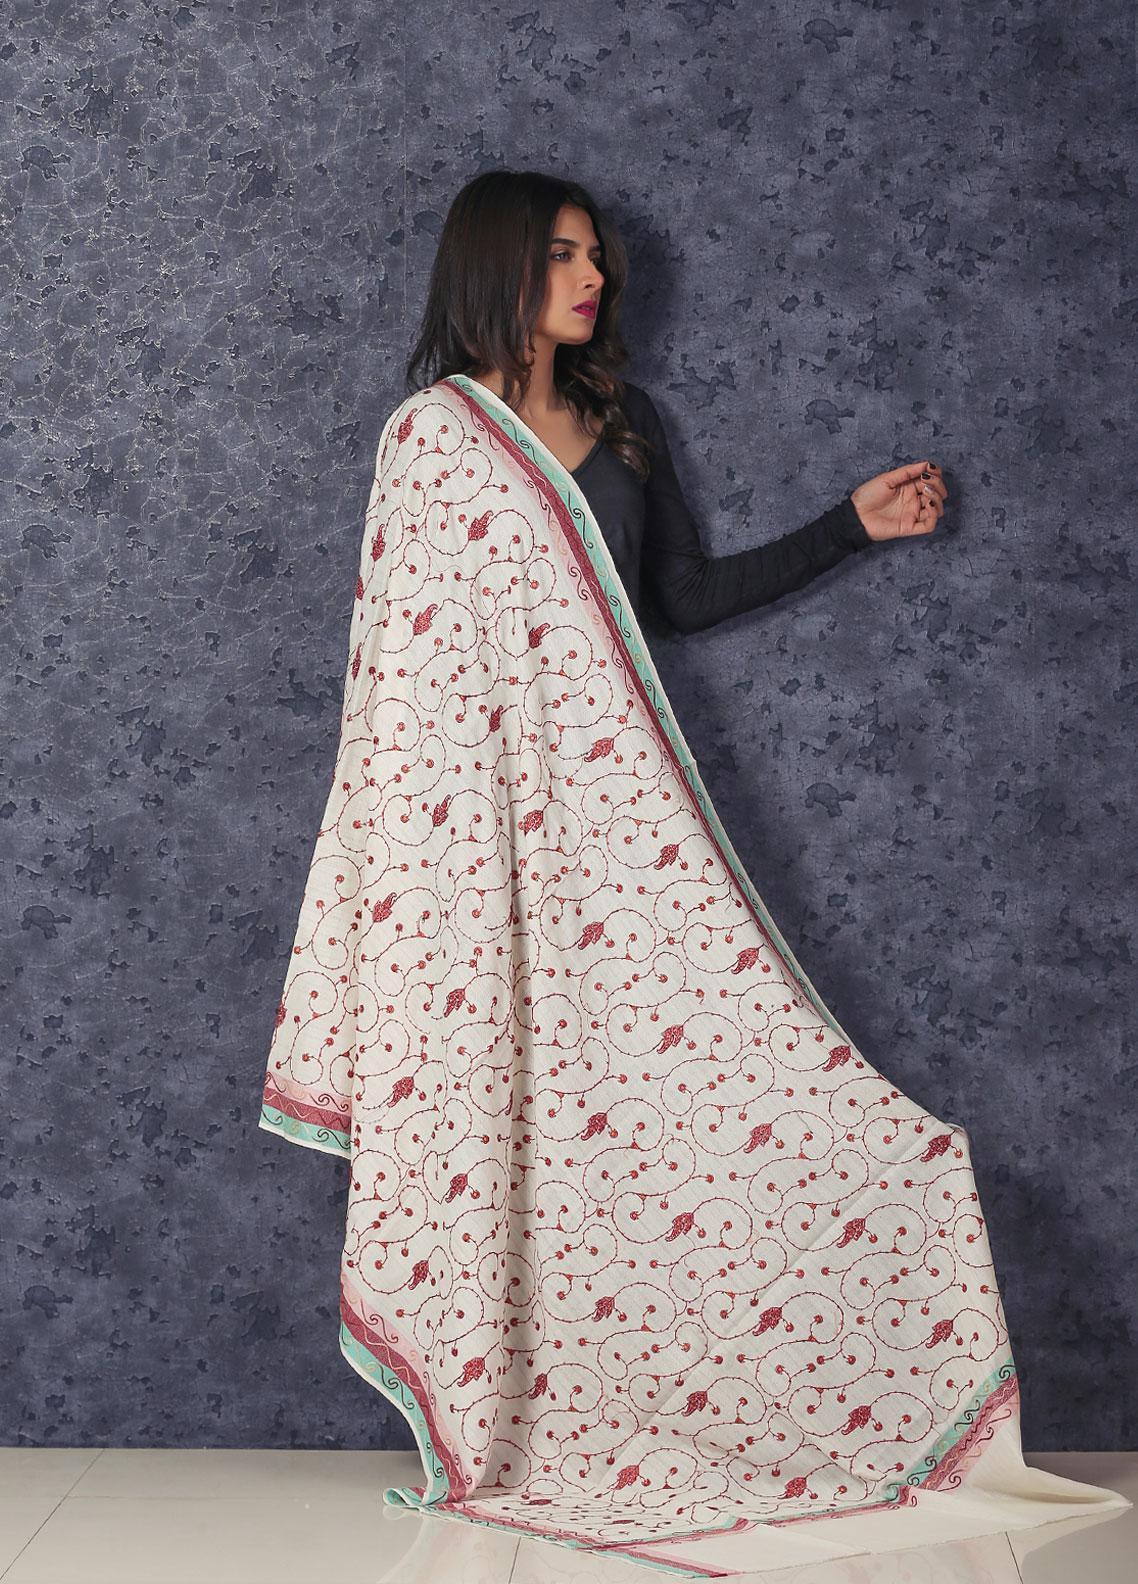 Sanaulla Exclusive Range Embroidered Pashmina  Shawl MIR-56 Off White - Kashmiri Shawls